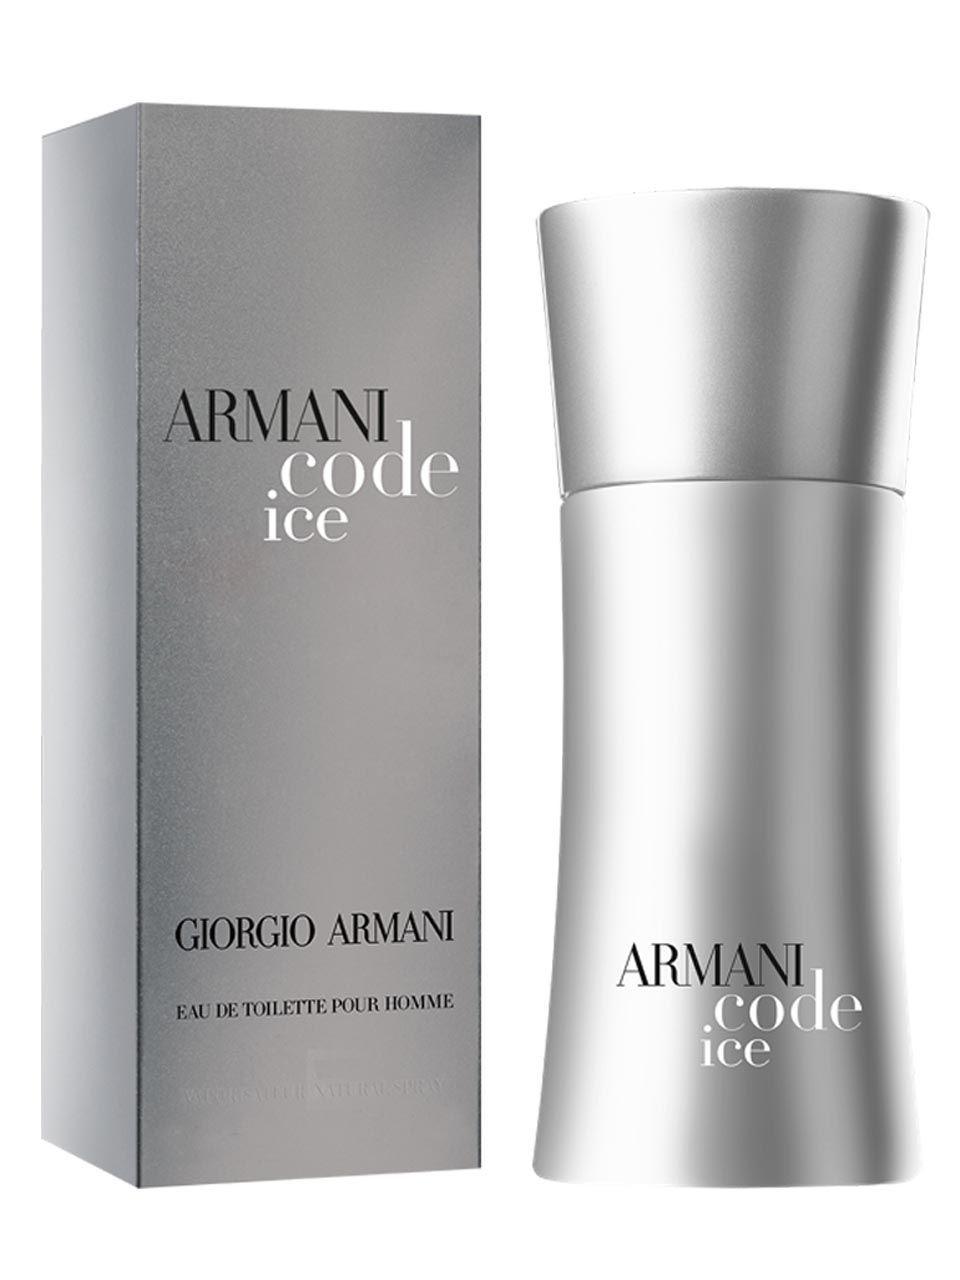 Armani Code Ice For Men 75ml Nước Hoa Nam Armani Code Giorgio